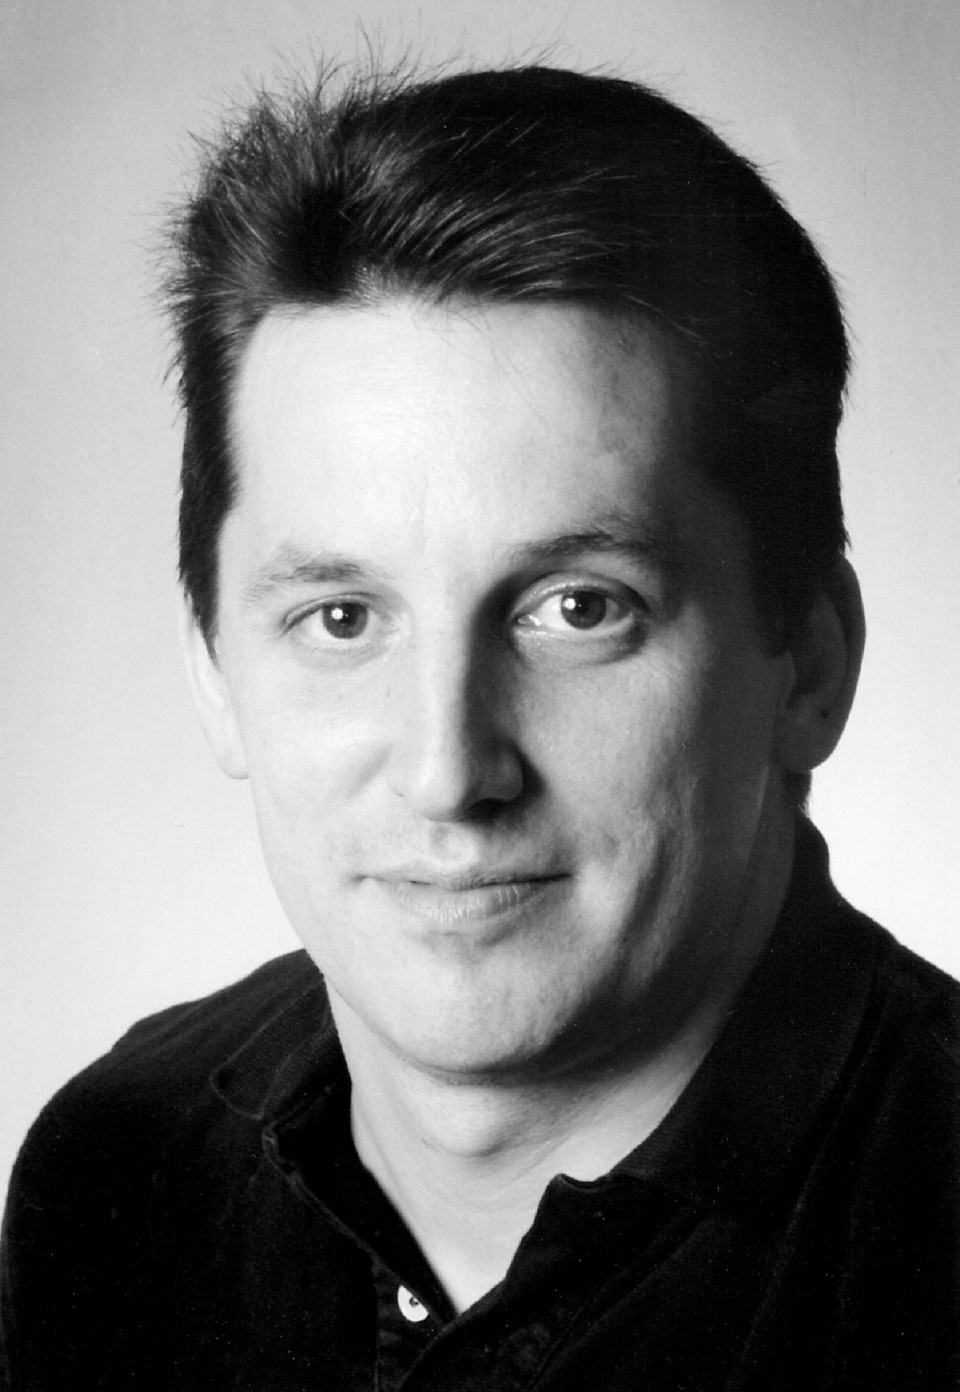 Randall Smith [Photo: André Pierre Leduc, Toronto (Ontario, Canada), 1999]